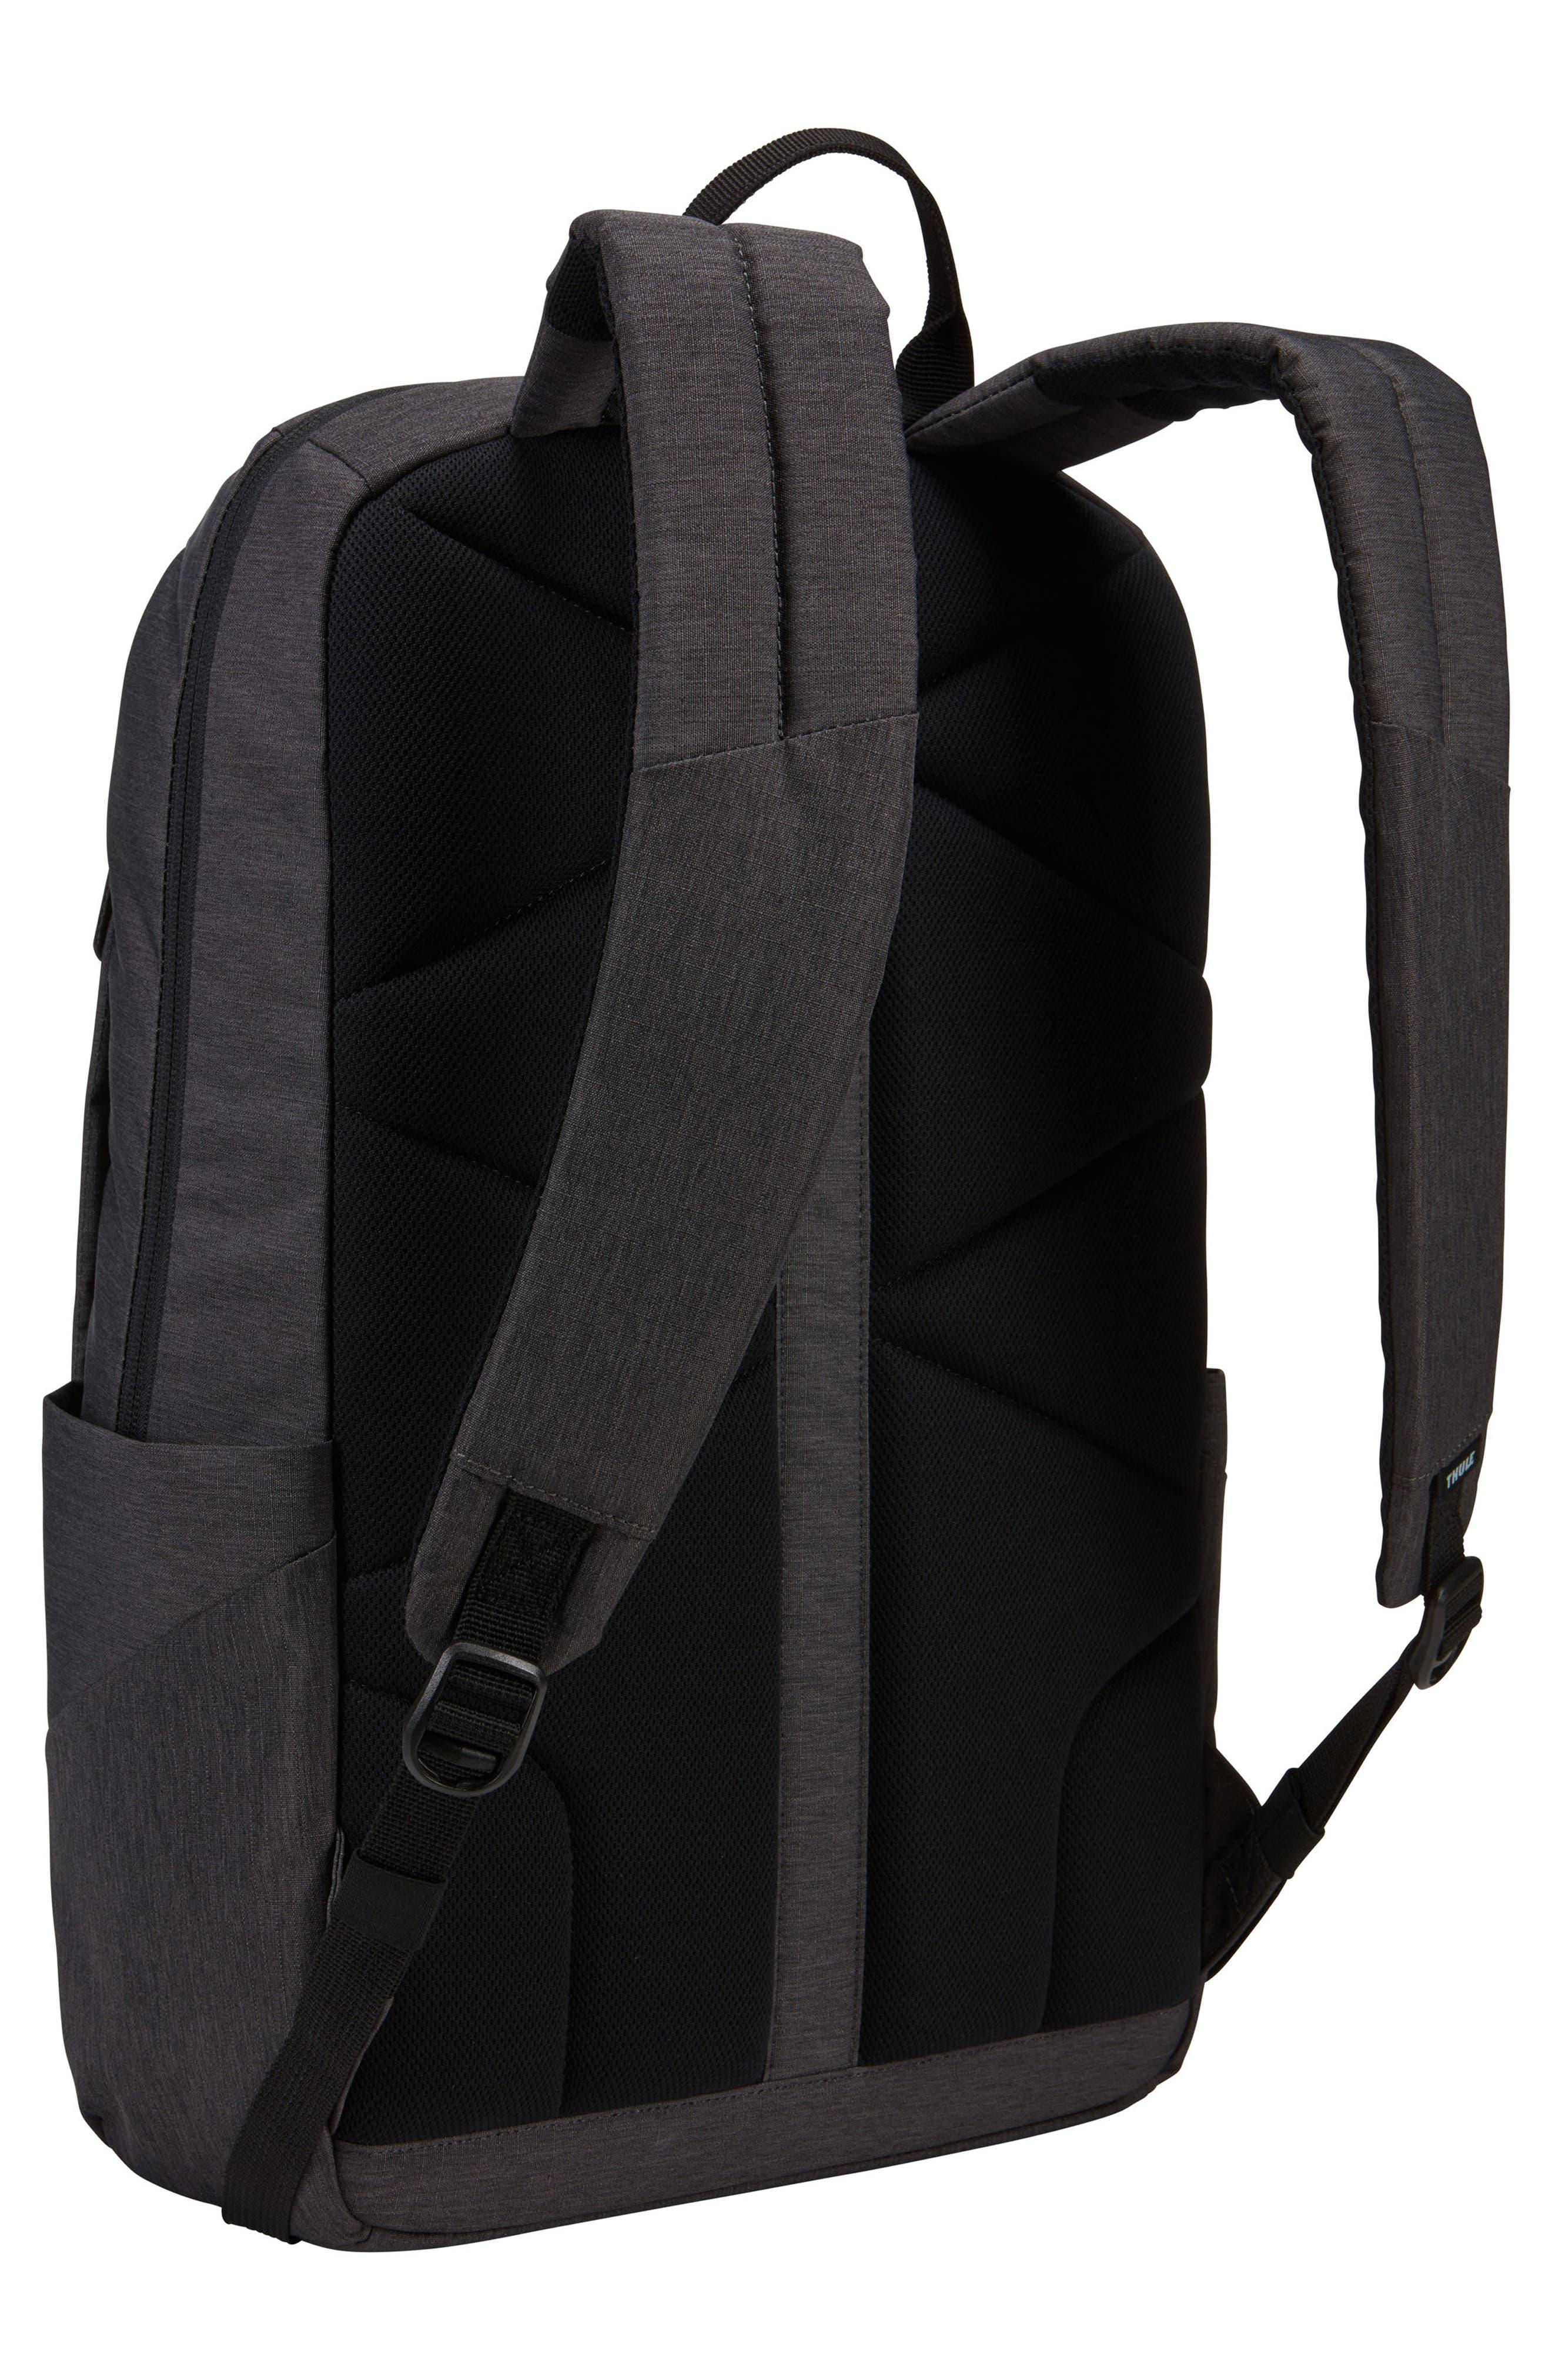 Lithos Backpack,                             Alternate thumbnail 2, color,                             Black